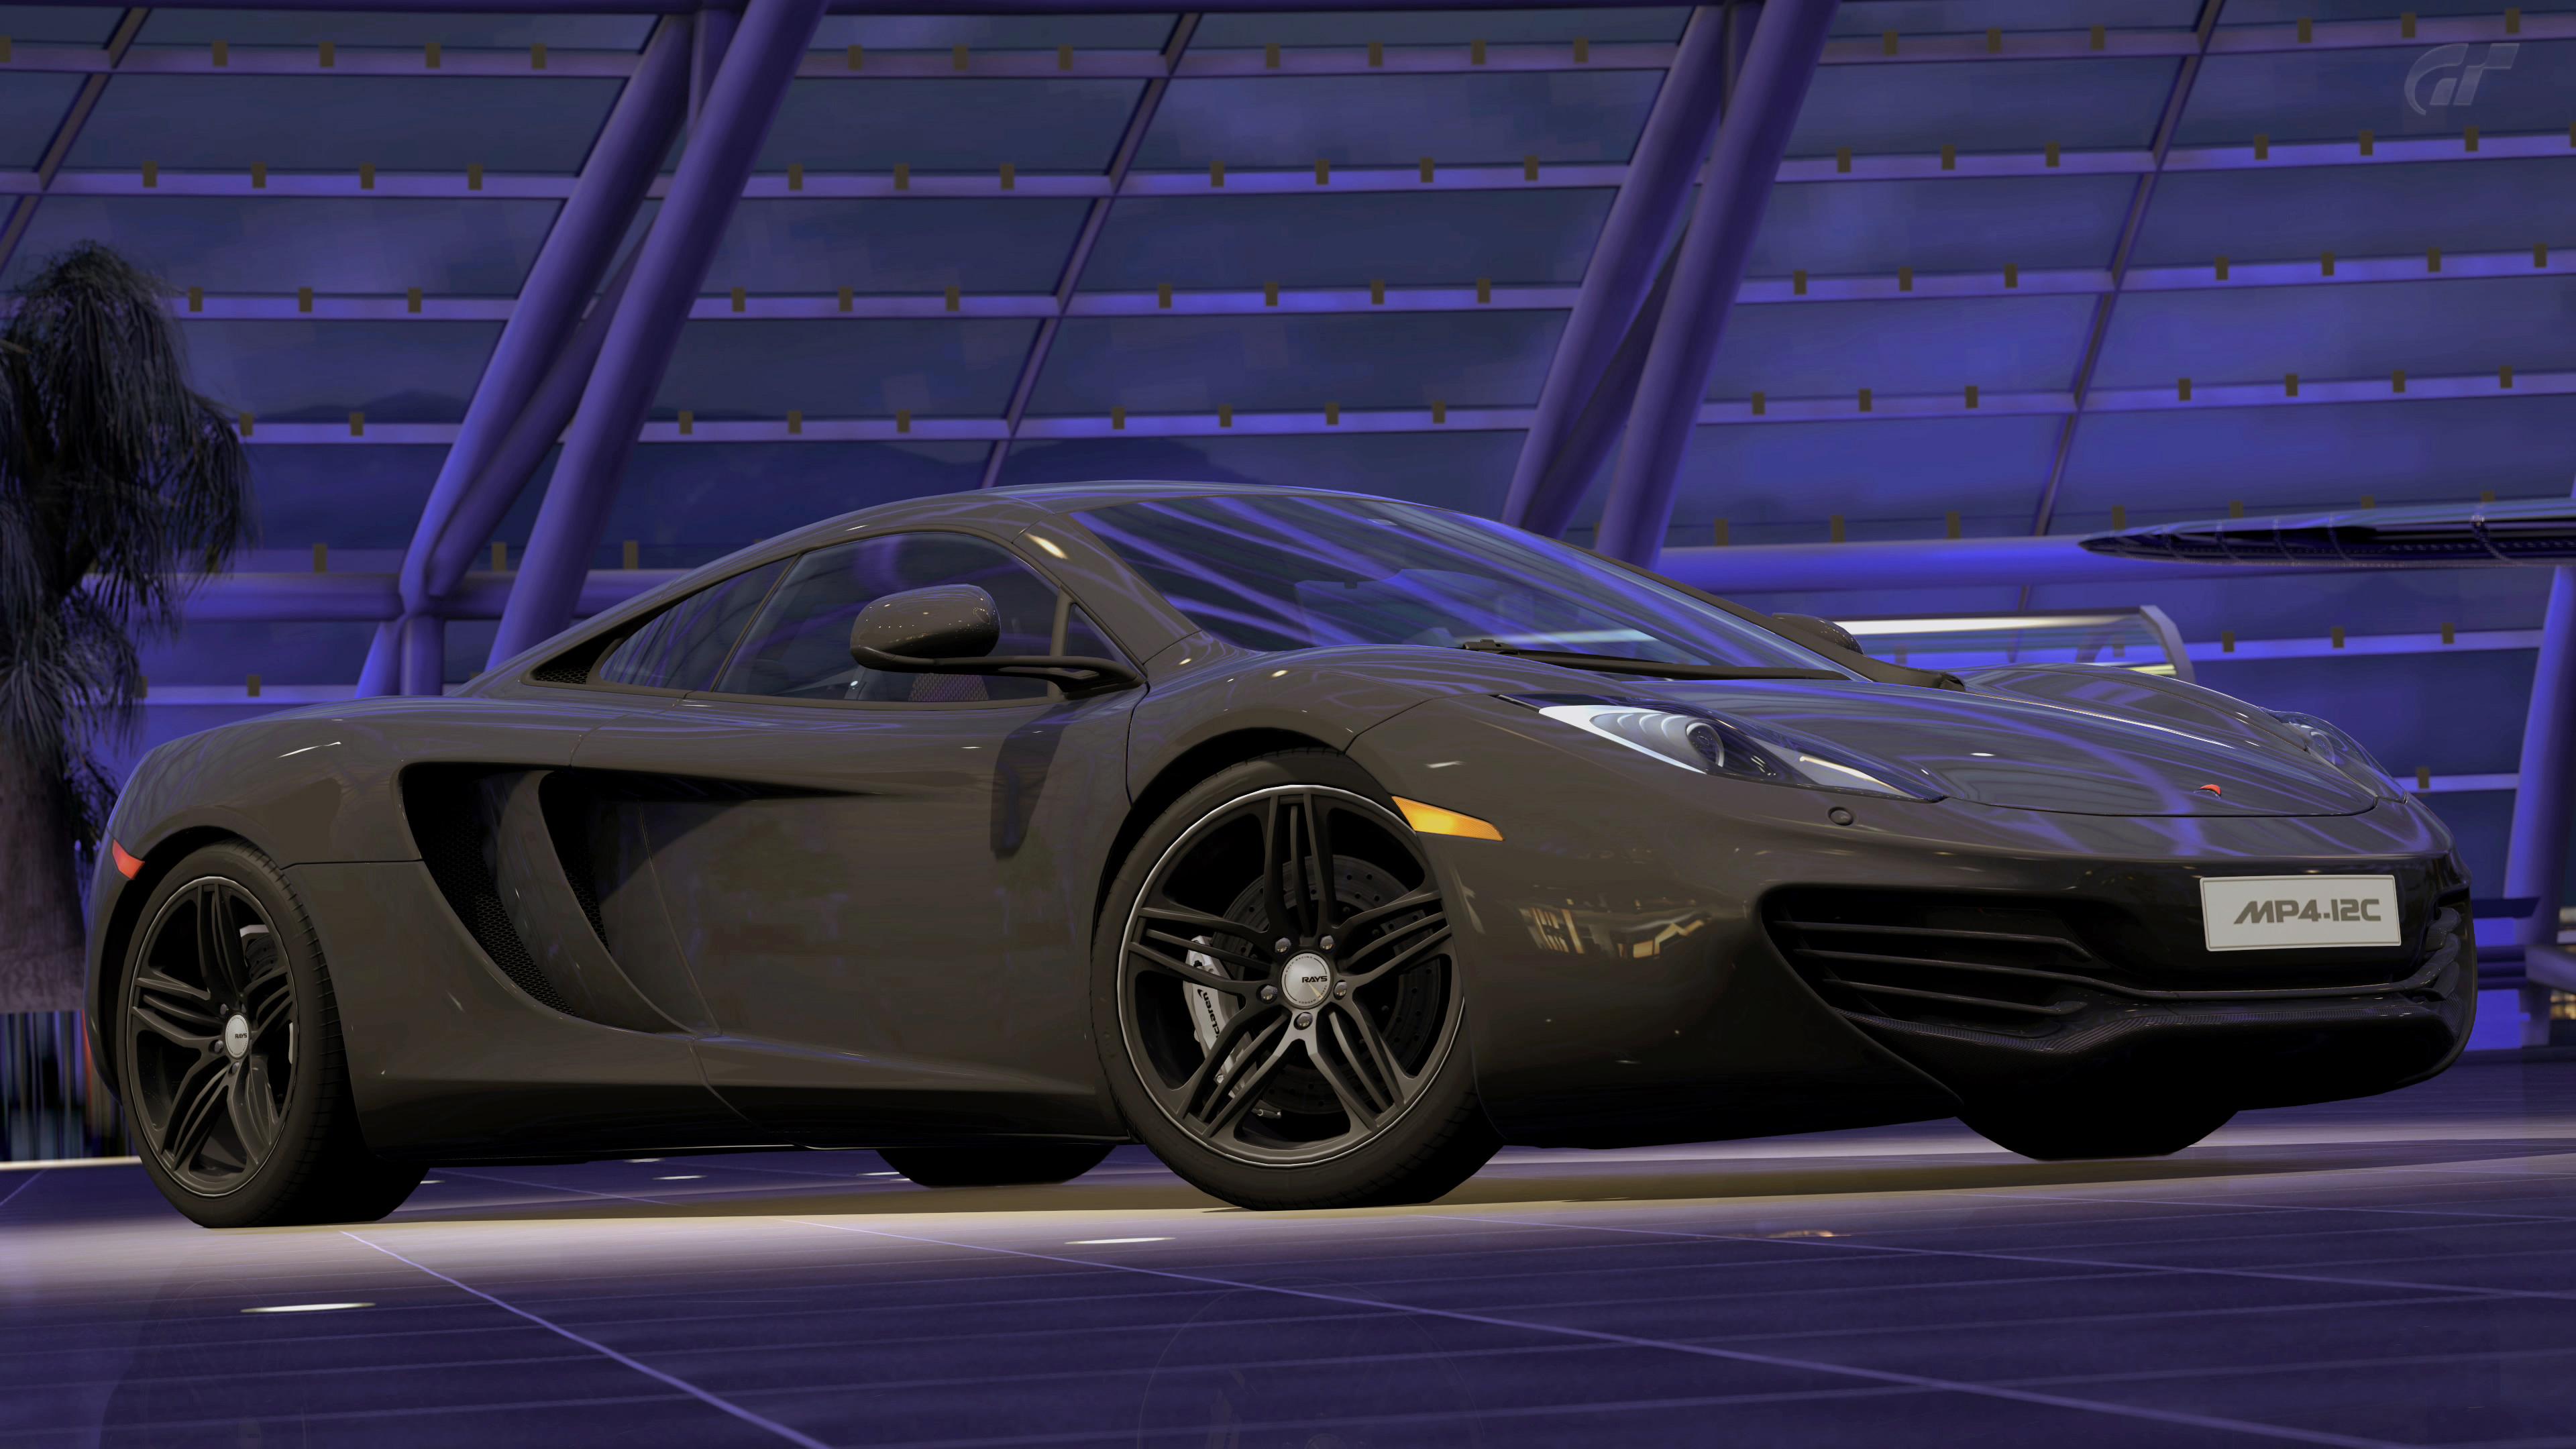 2010 Mclaren MP4-12C (Gran Turismo 5) by Vertualissimo